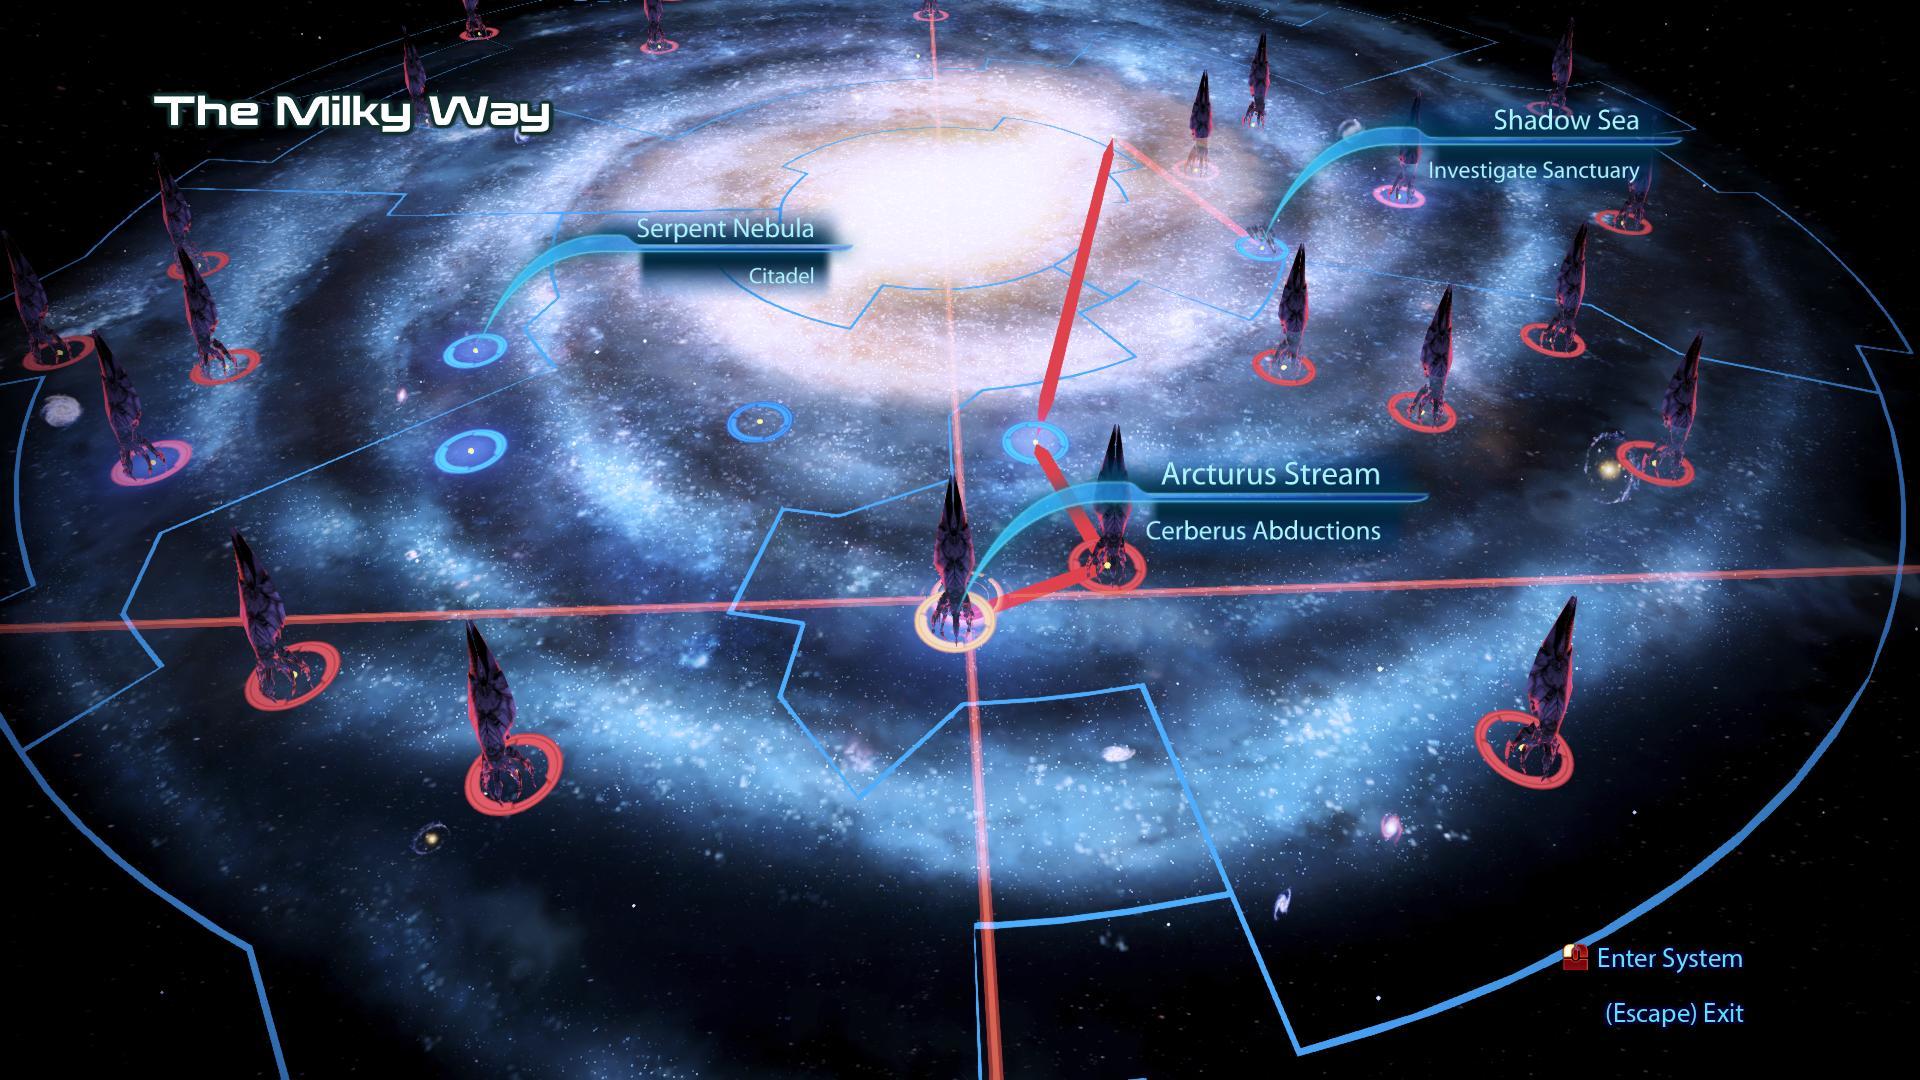 Mass Effect 3 Galaxy at War Assets in the Galaxy Map